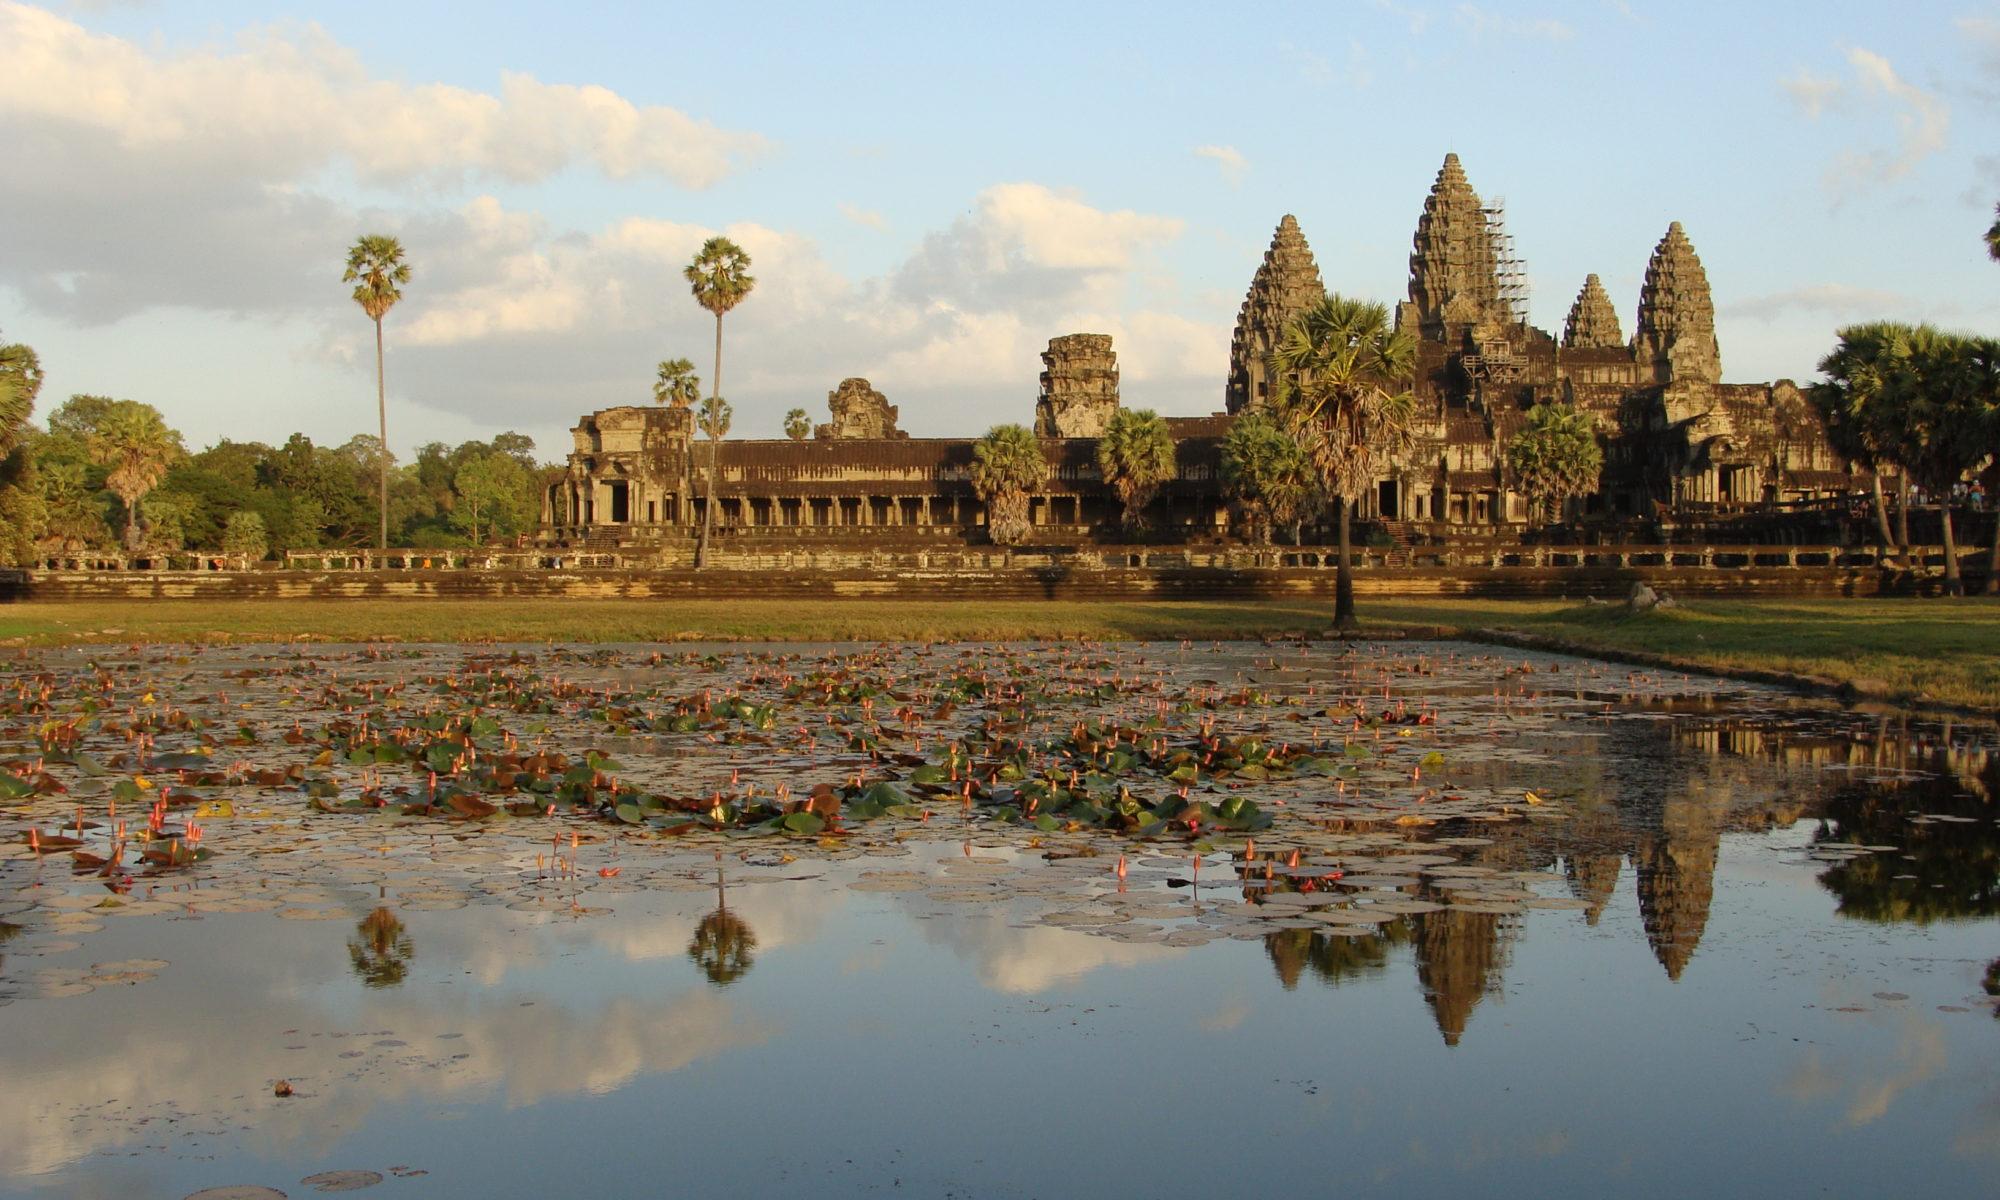 Cambodge - Siem Rep - Angkor - Angkor Vat - vue d'ensemble